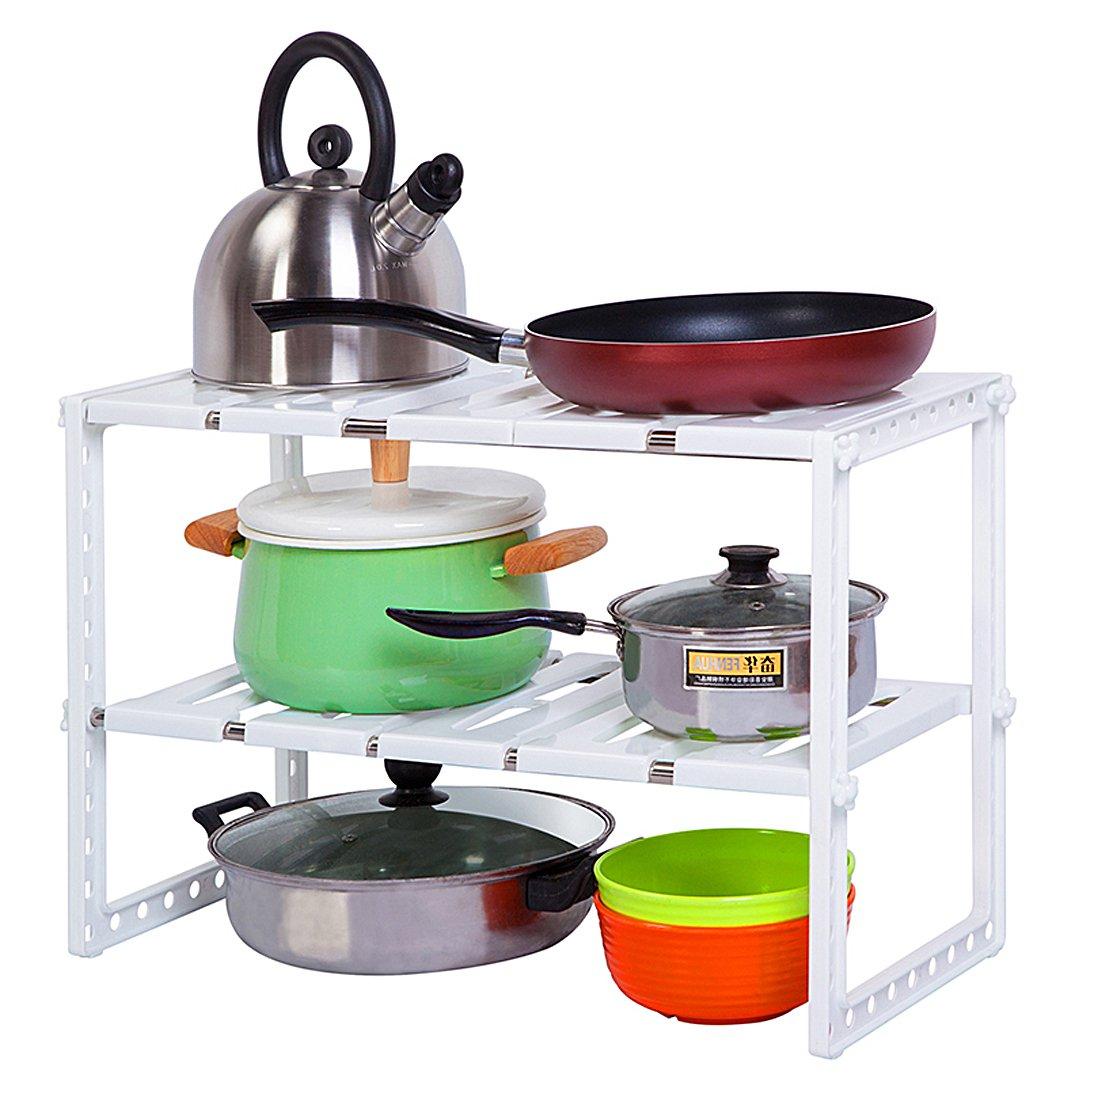 YOMYM Under Sink Organizer 2 Tier Expandable Adjustable Shelf with Removable Panels Kitchen Cabinet Storage Organizer, White